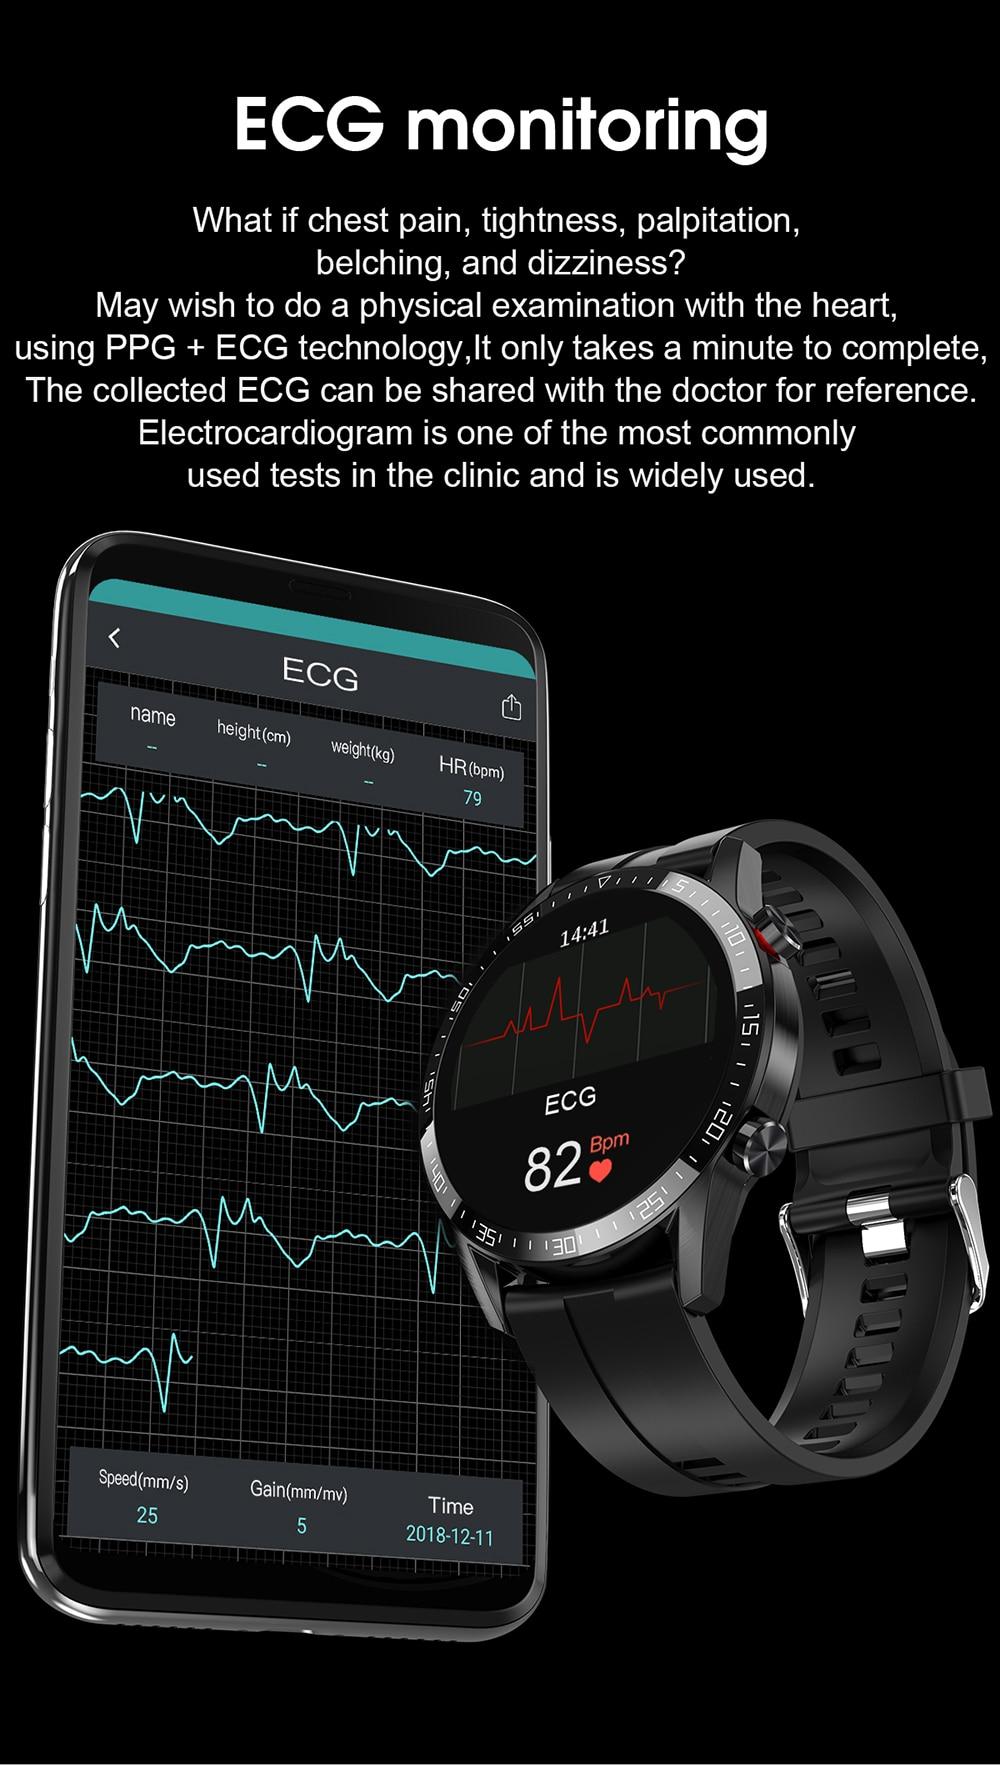 H52be1ec75edb4b1b883ac46cc9c89dffi Reloj Inteligente Hombre Smart Watch Men 2020 Android IP68 Smartwatch Answer Call Smart Watch Man For Huawei Android Apple Phone